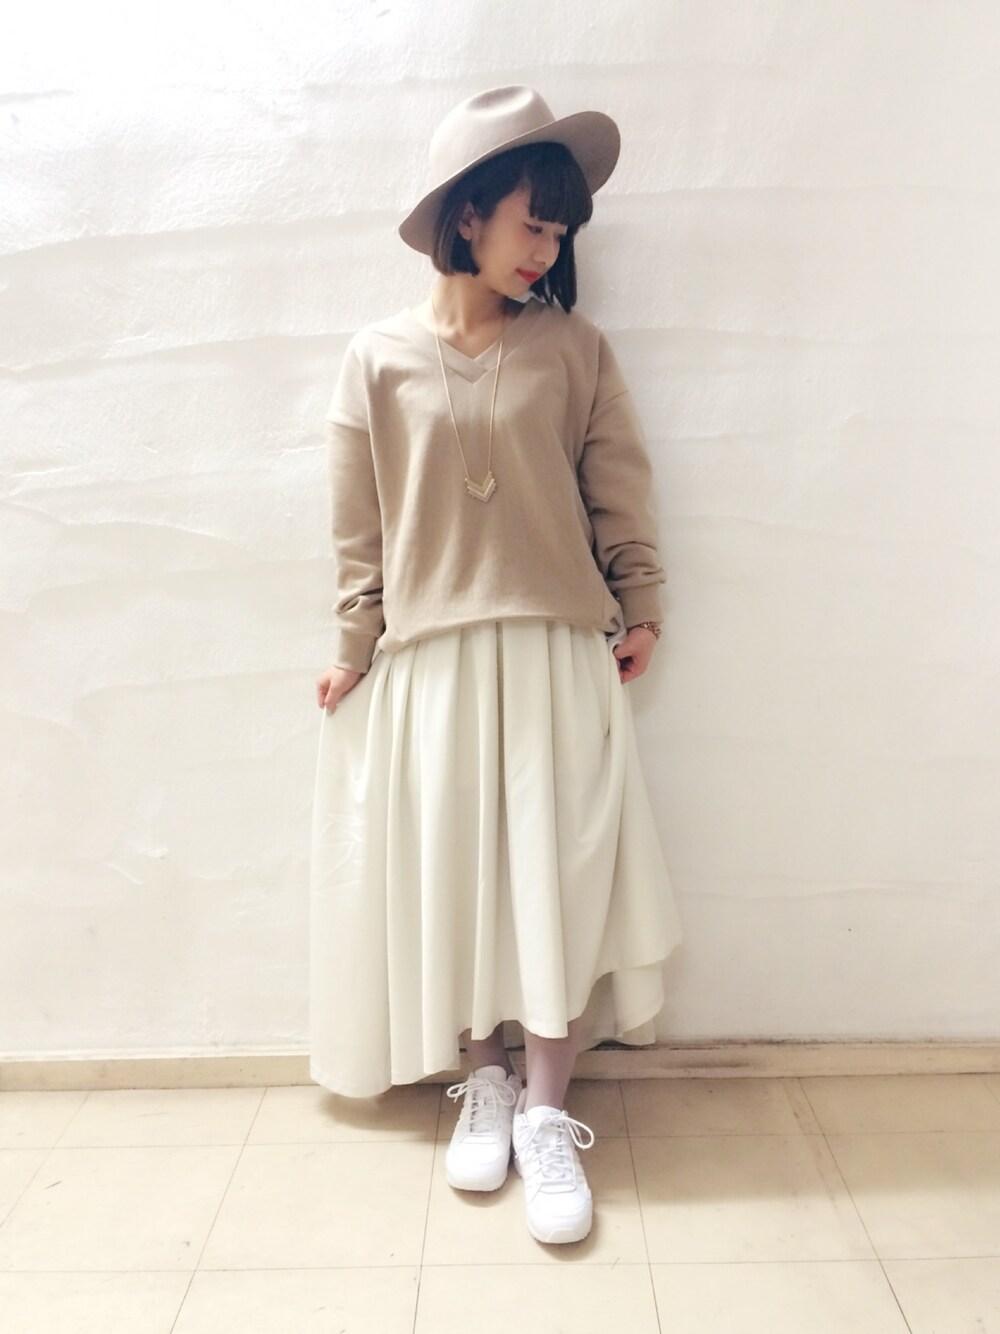 出典:http://wear.jp/mariyamagata/6013838/